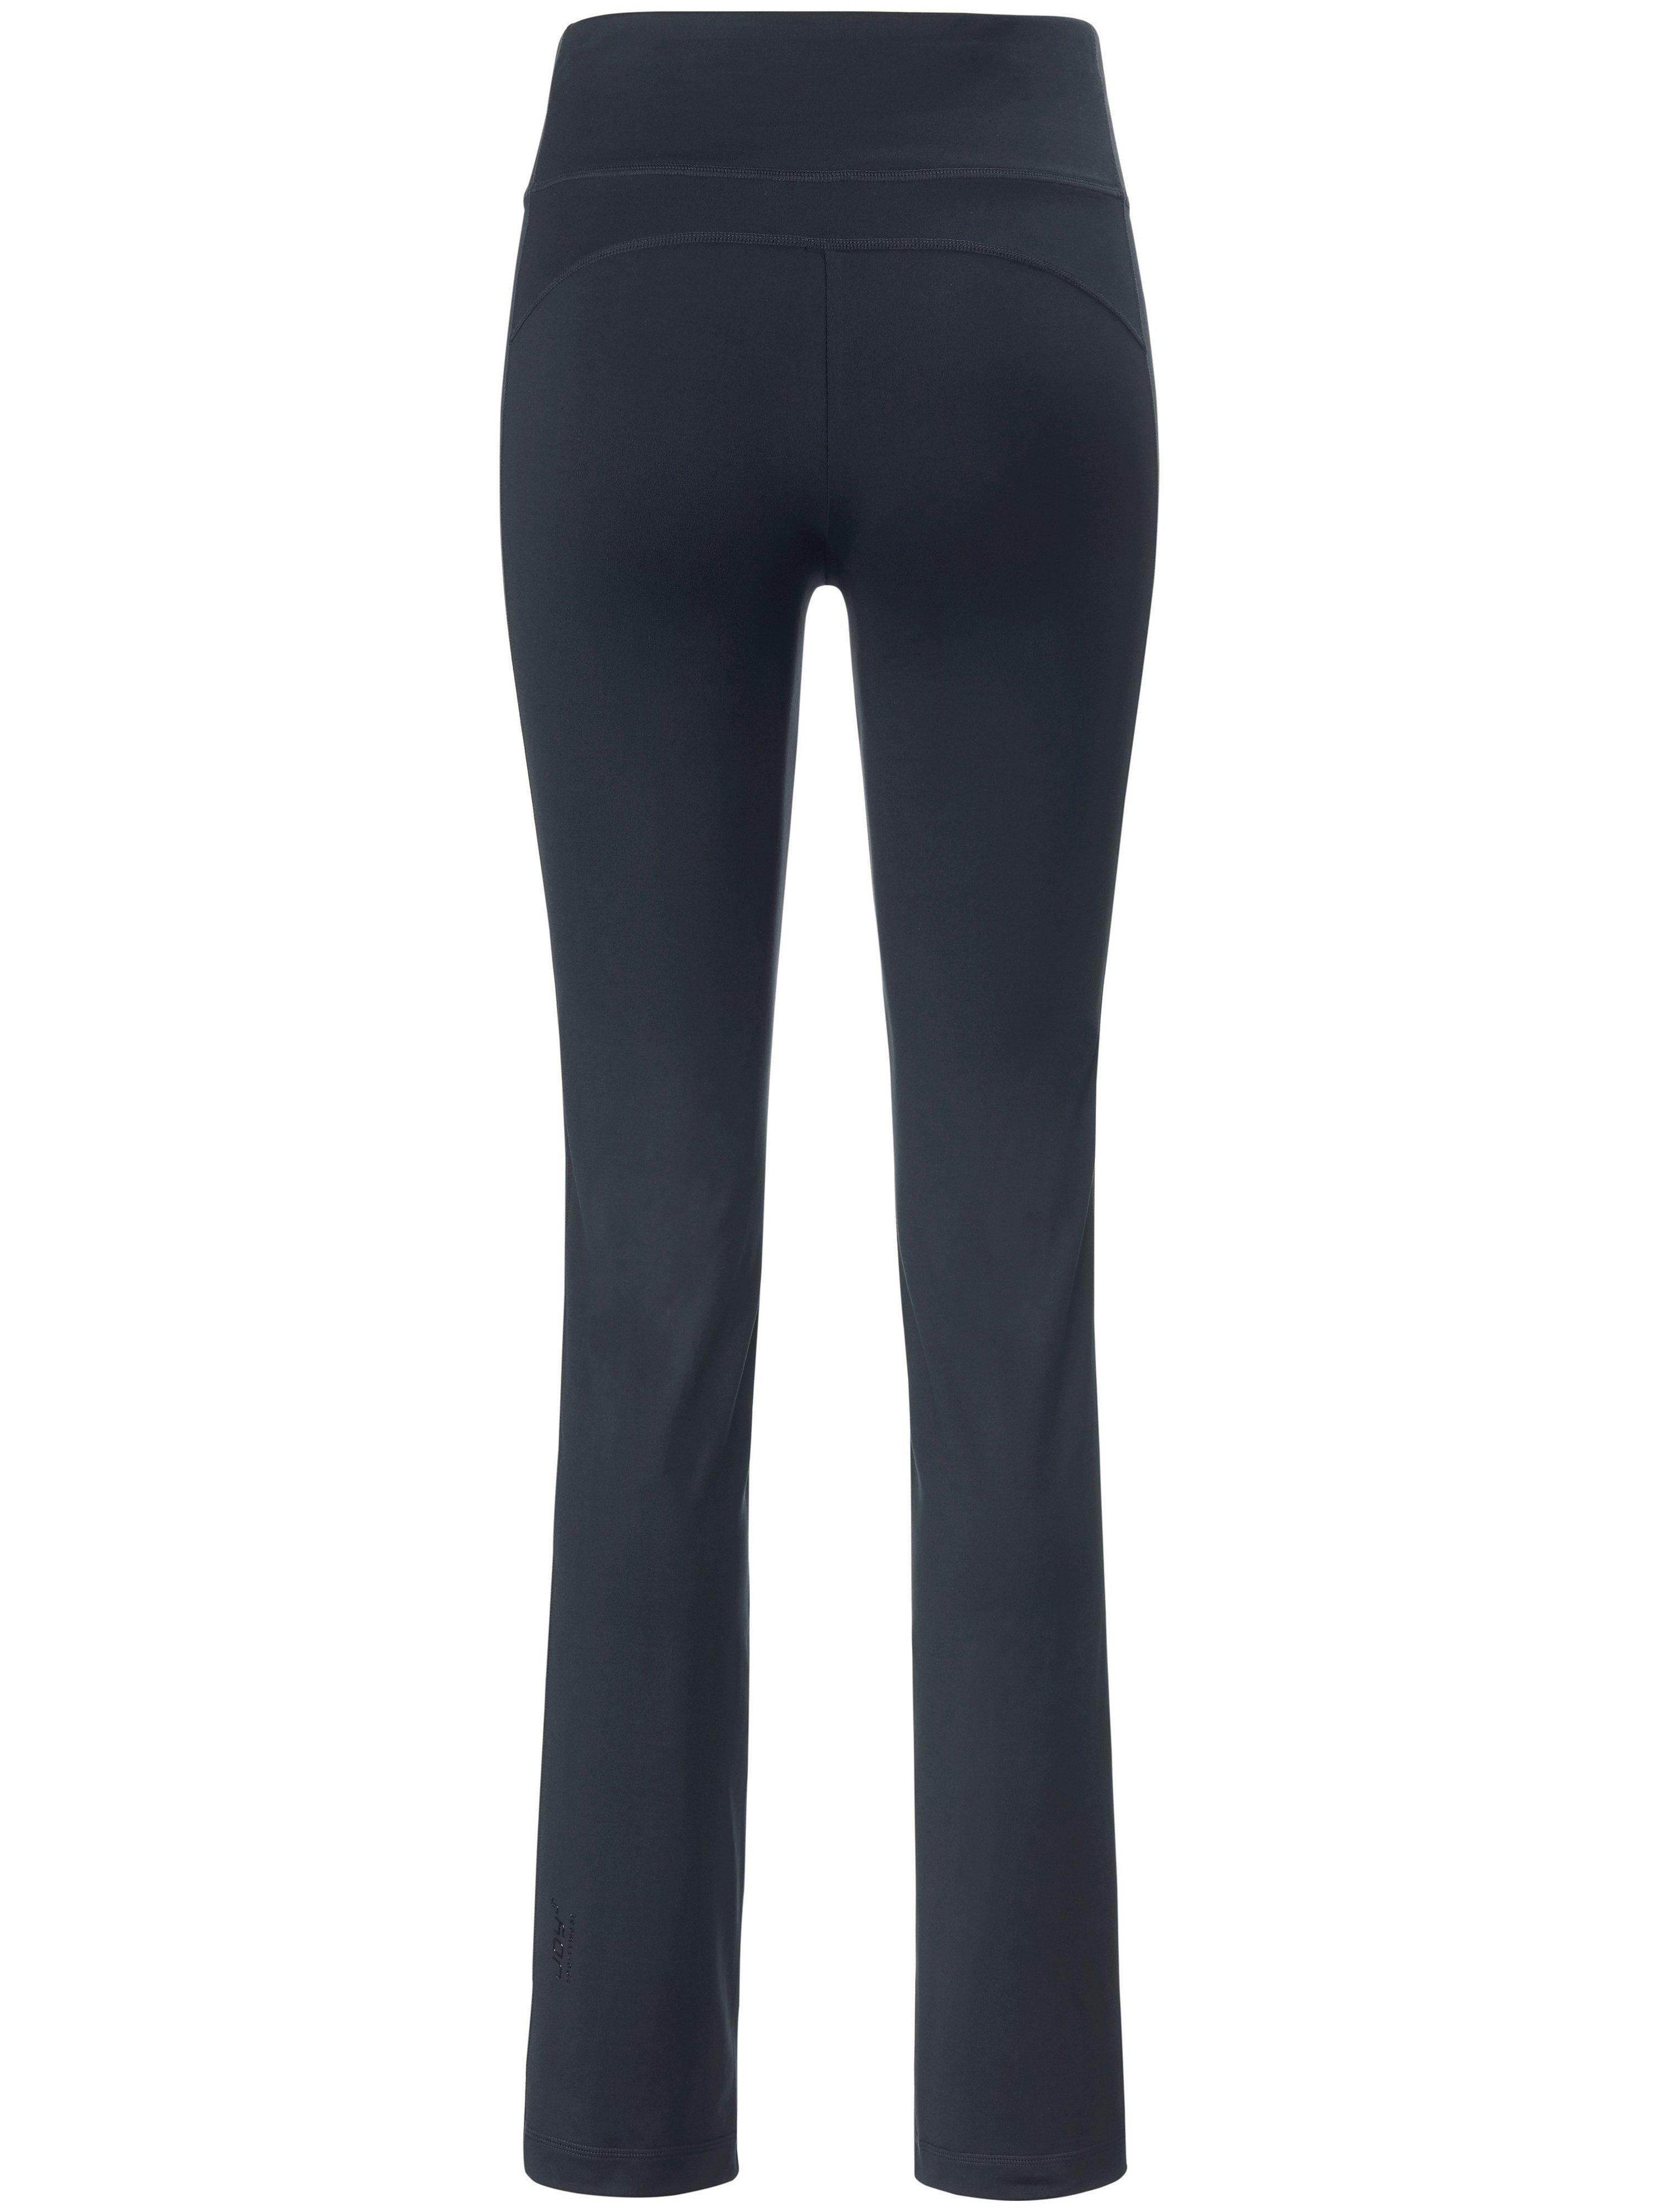 Buks BodyFit light model Marion Fra JOY Sportswear sort